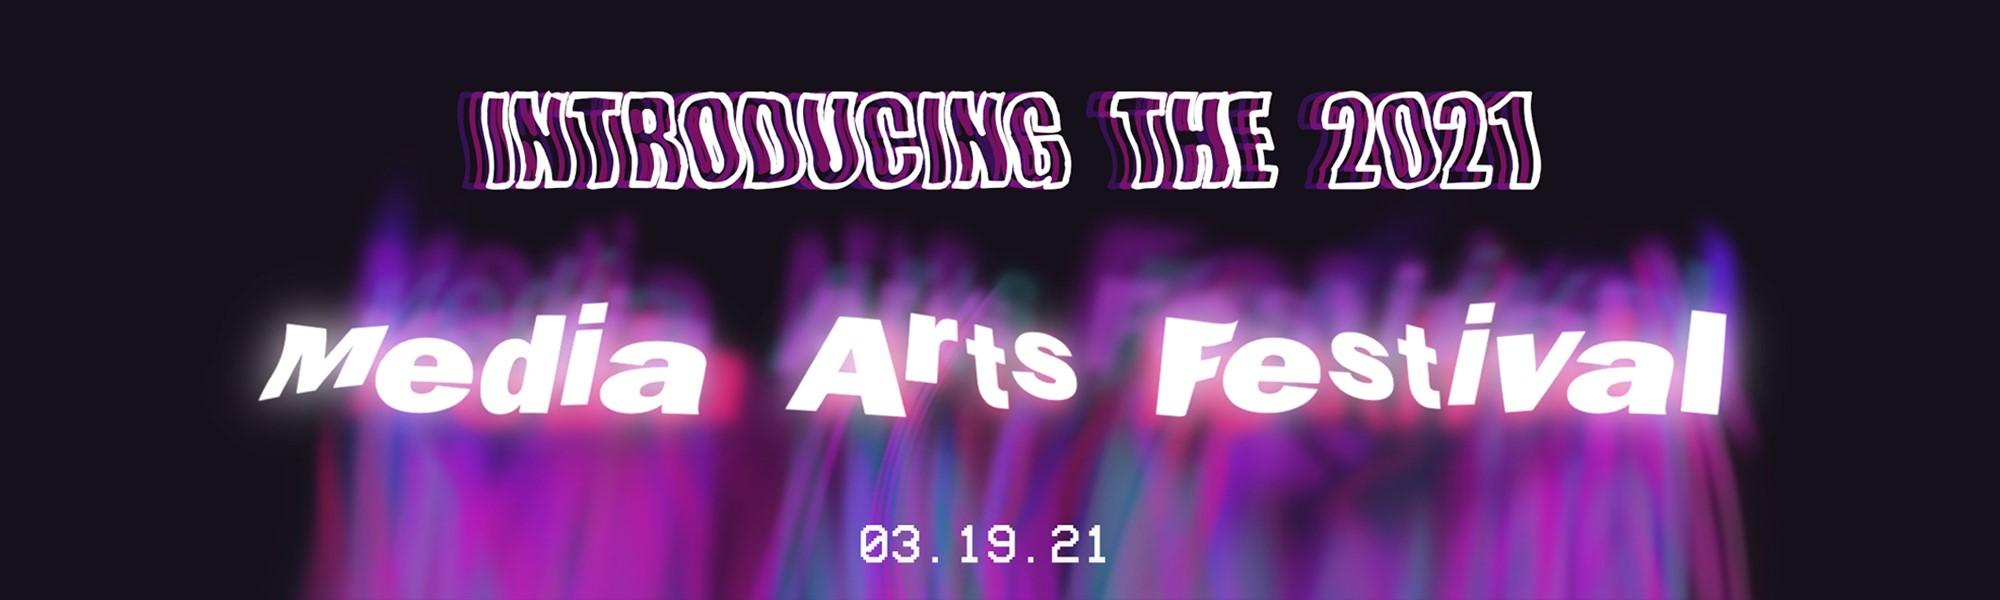 Introducing the Media Arts Festival